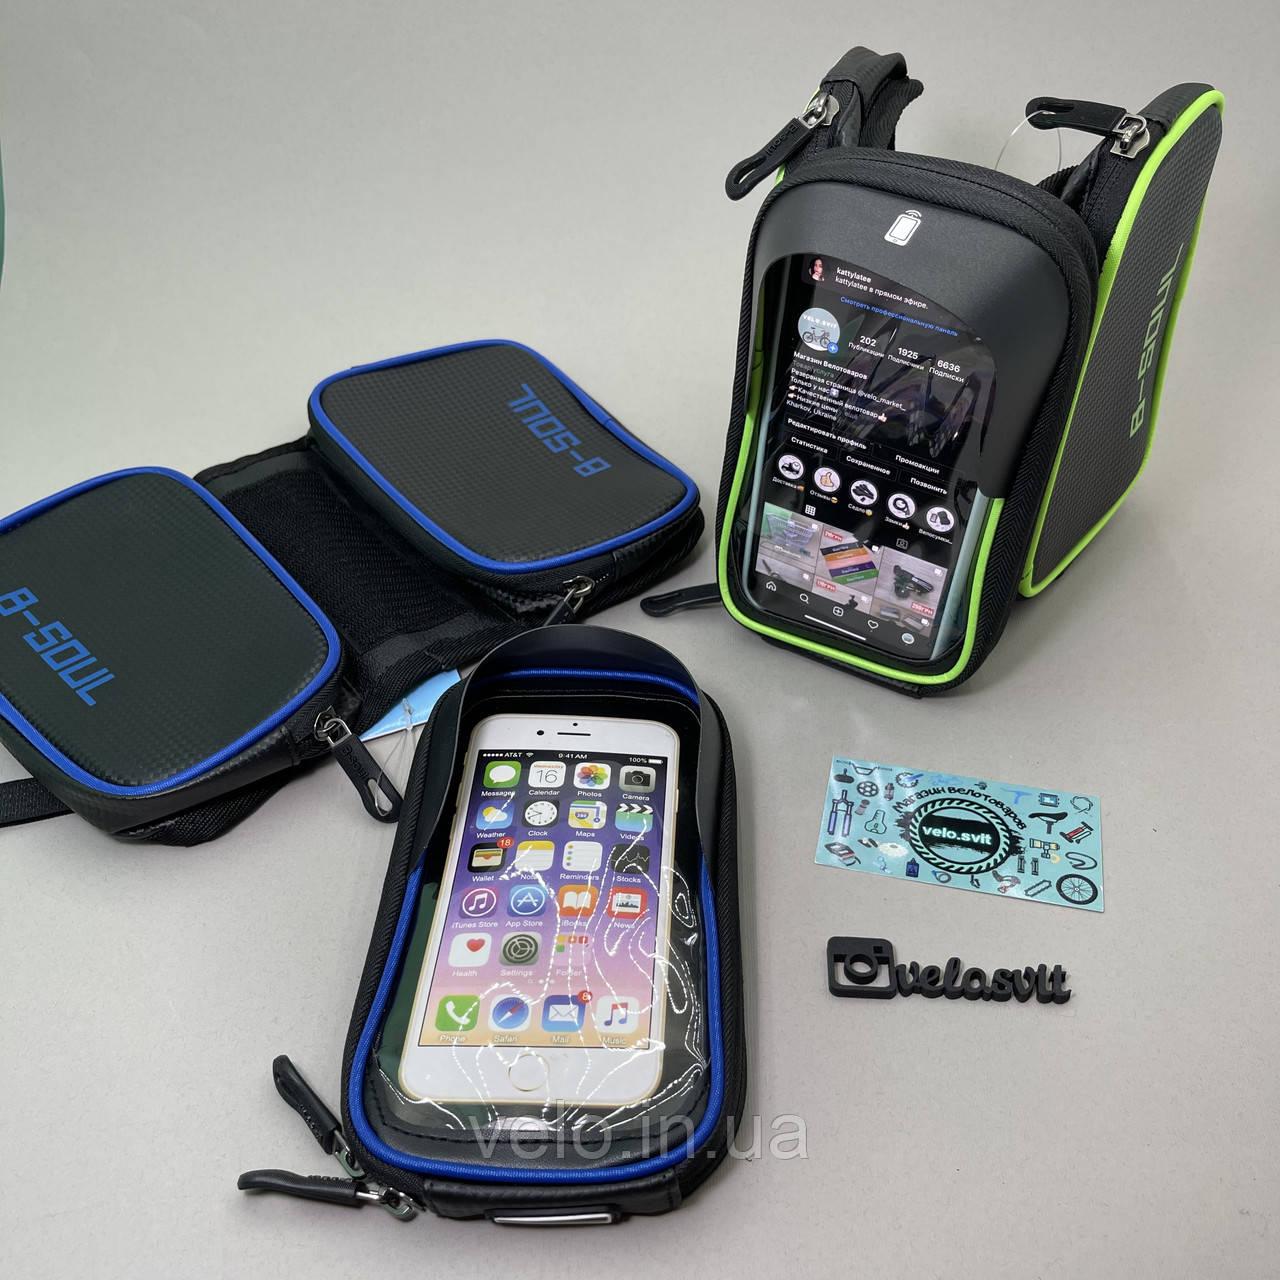 Велосумка под телефон, сумка на раму велосипеда, сумка под телефон